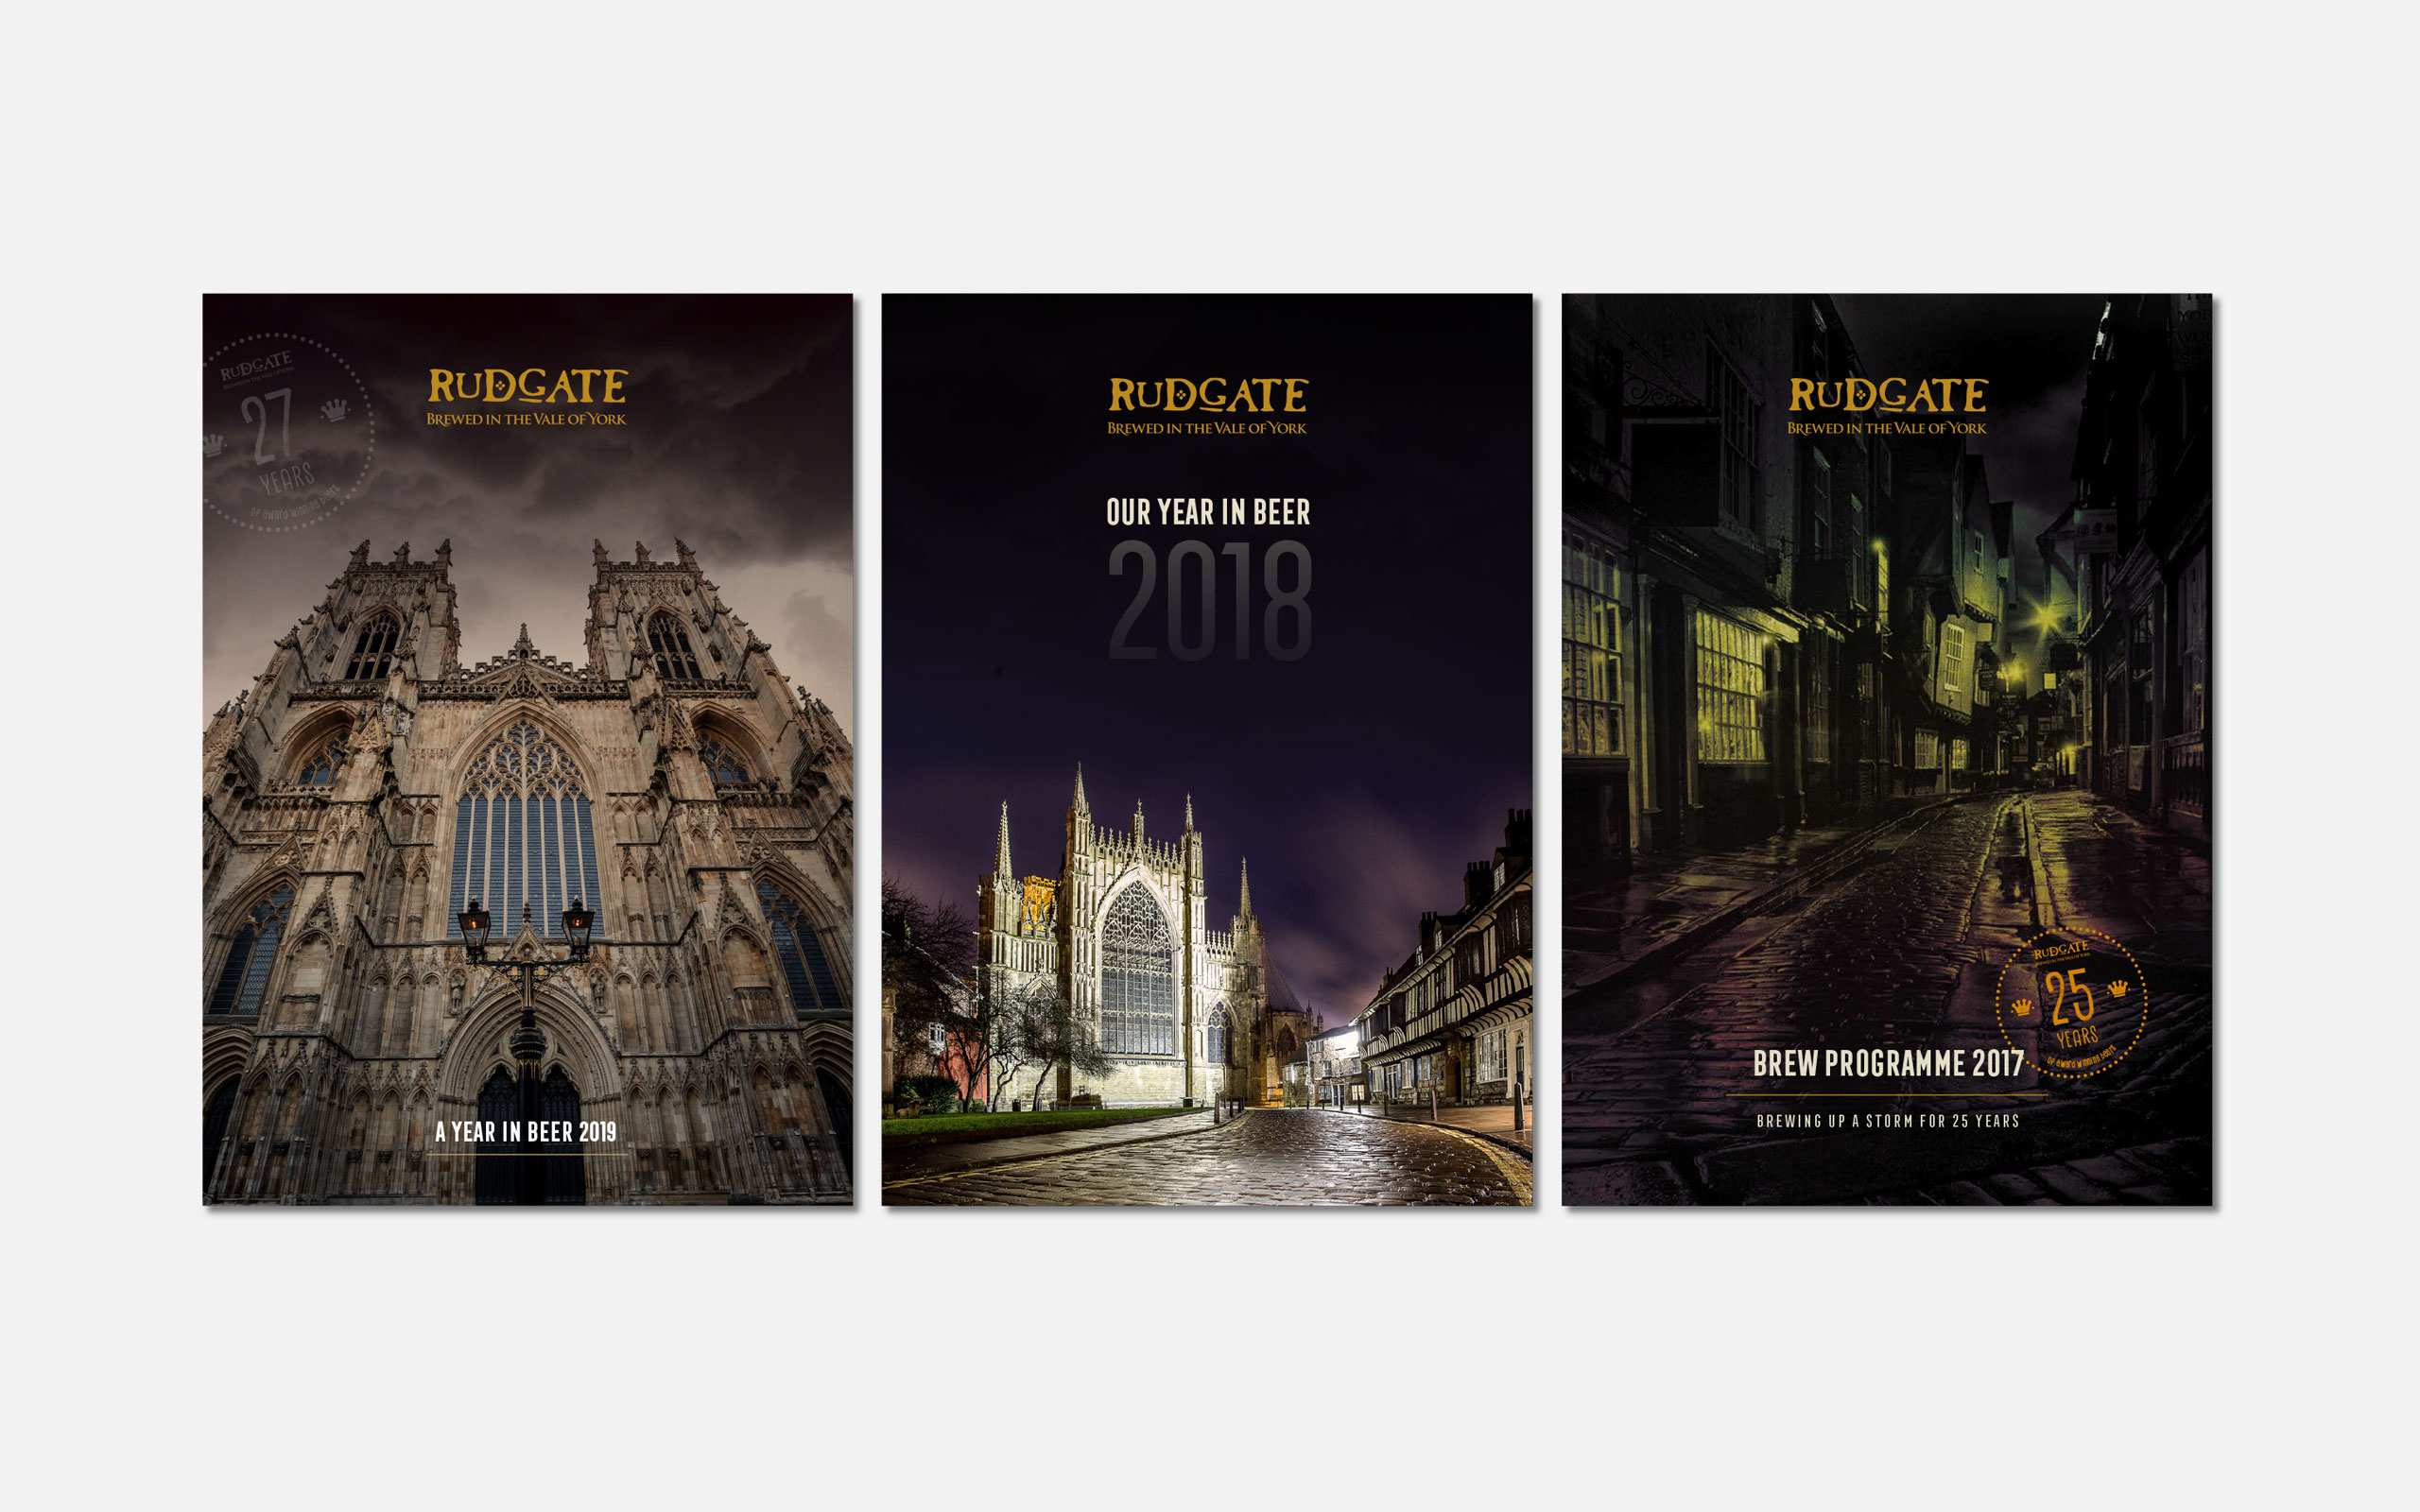 3 Rudgate Brew Programmes